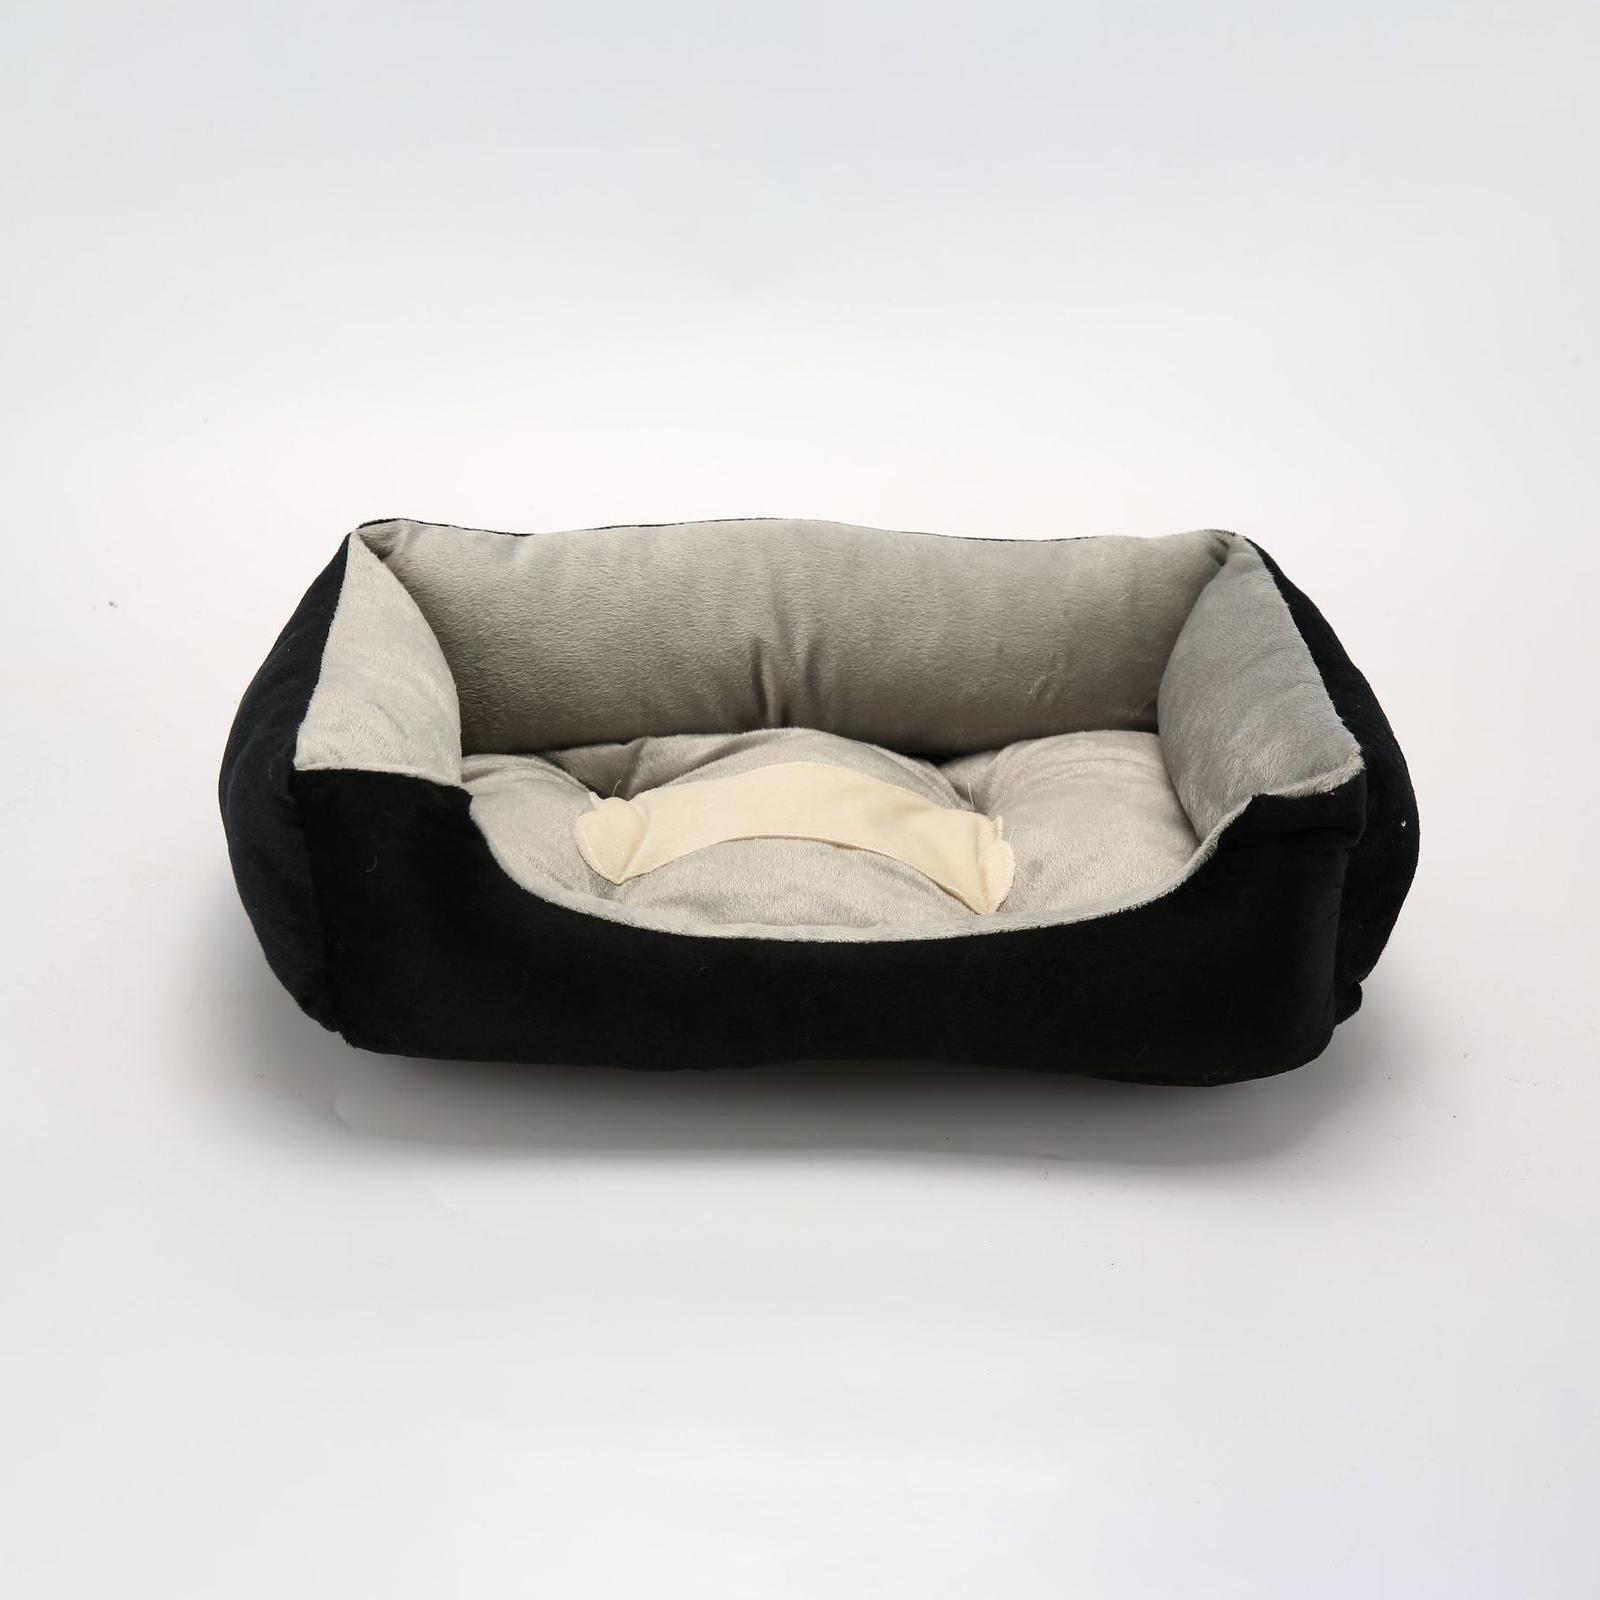 Ape Basics: Pet Kennel Warm Four Seasons Pet Mat - Grey (Large) image